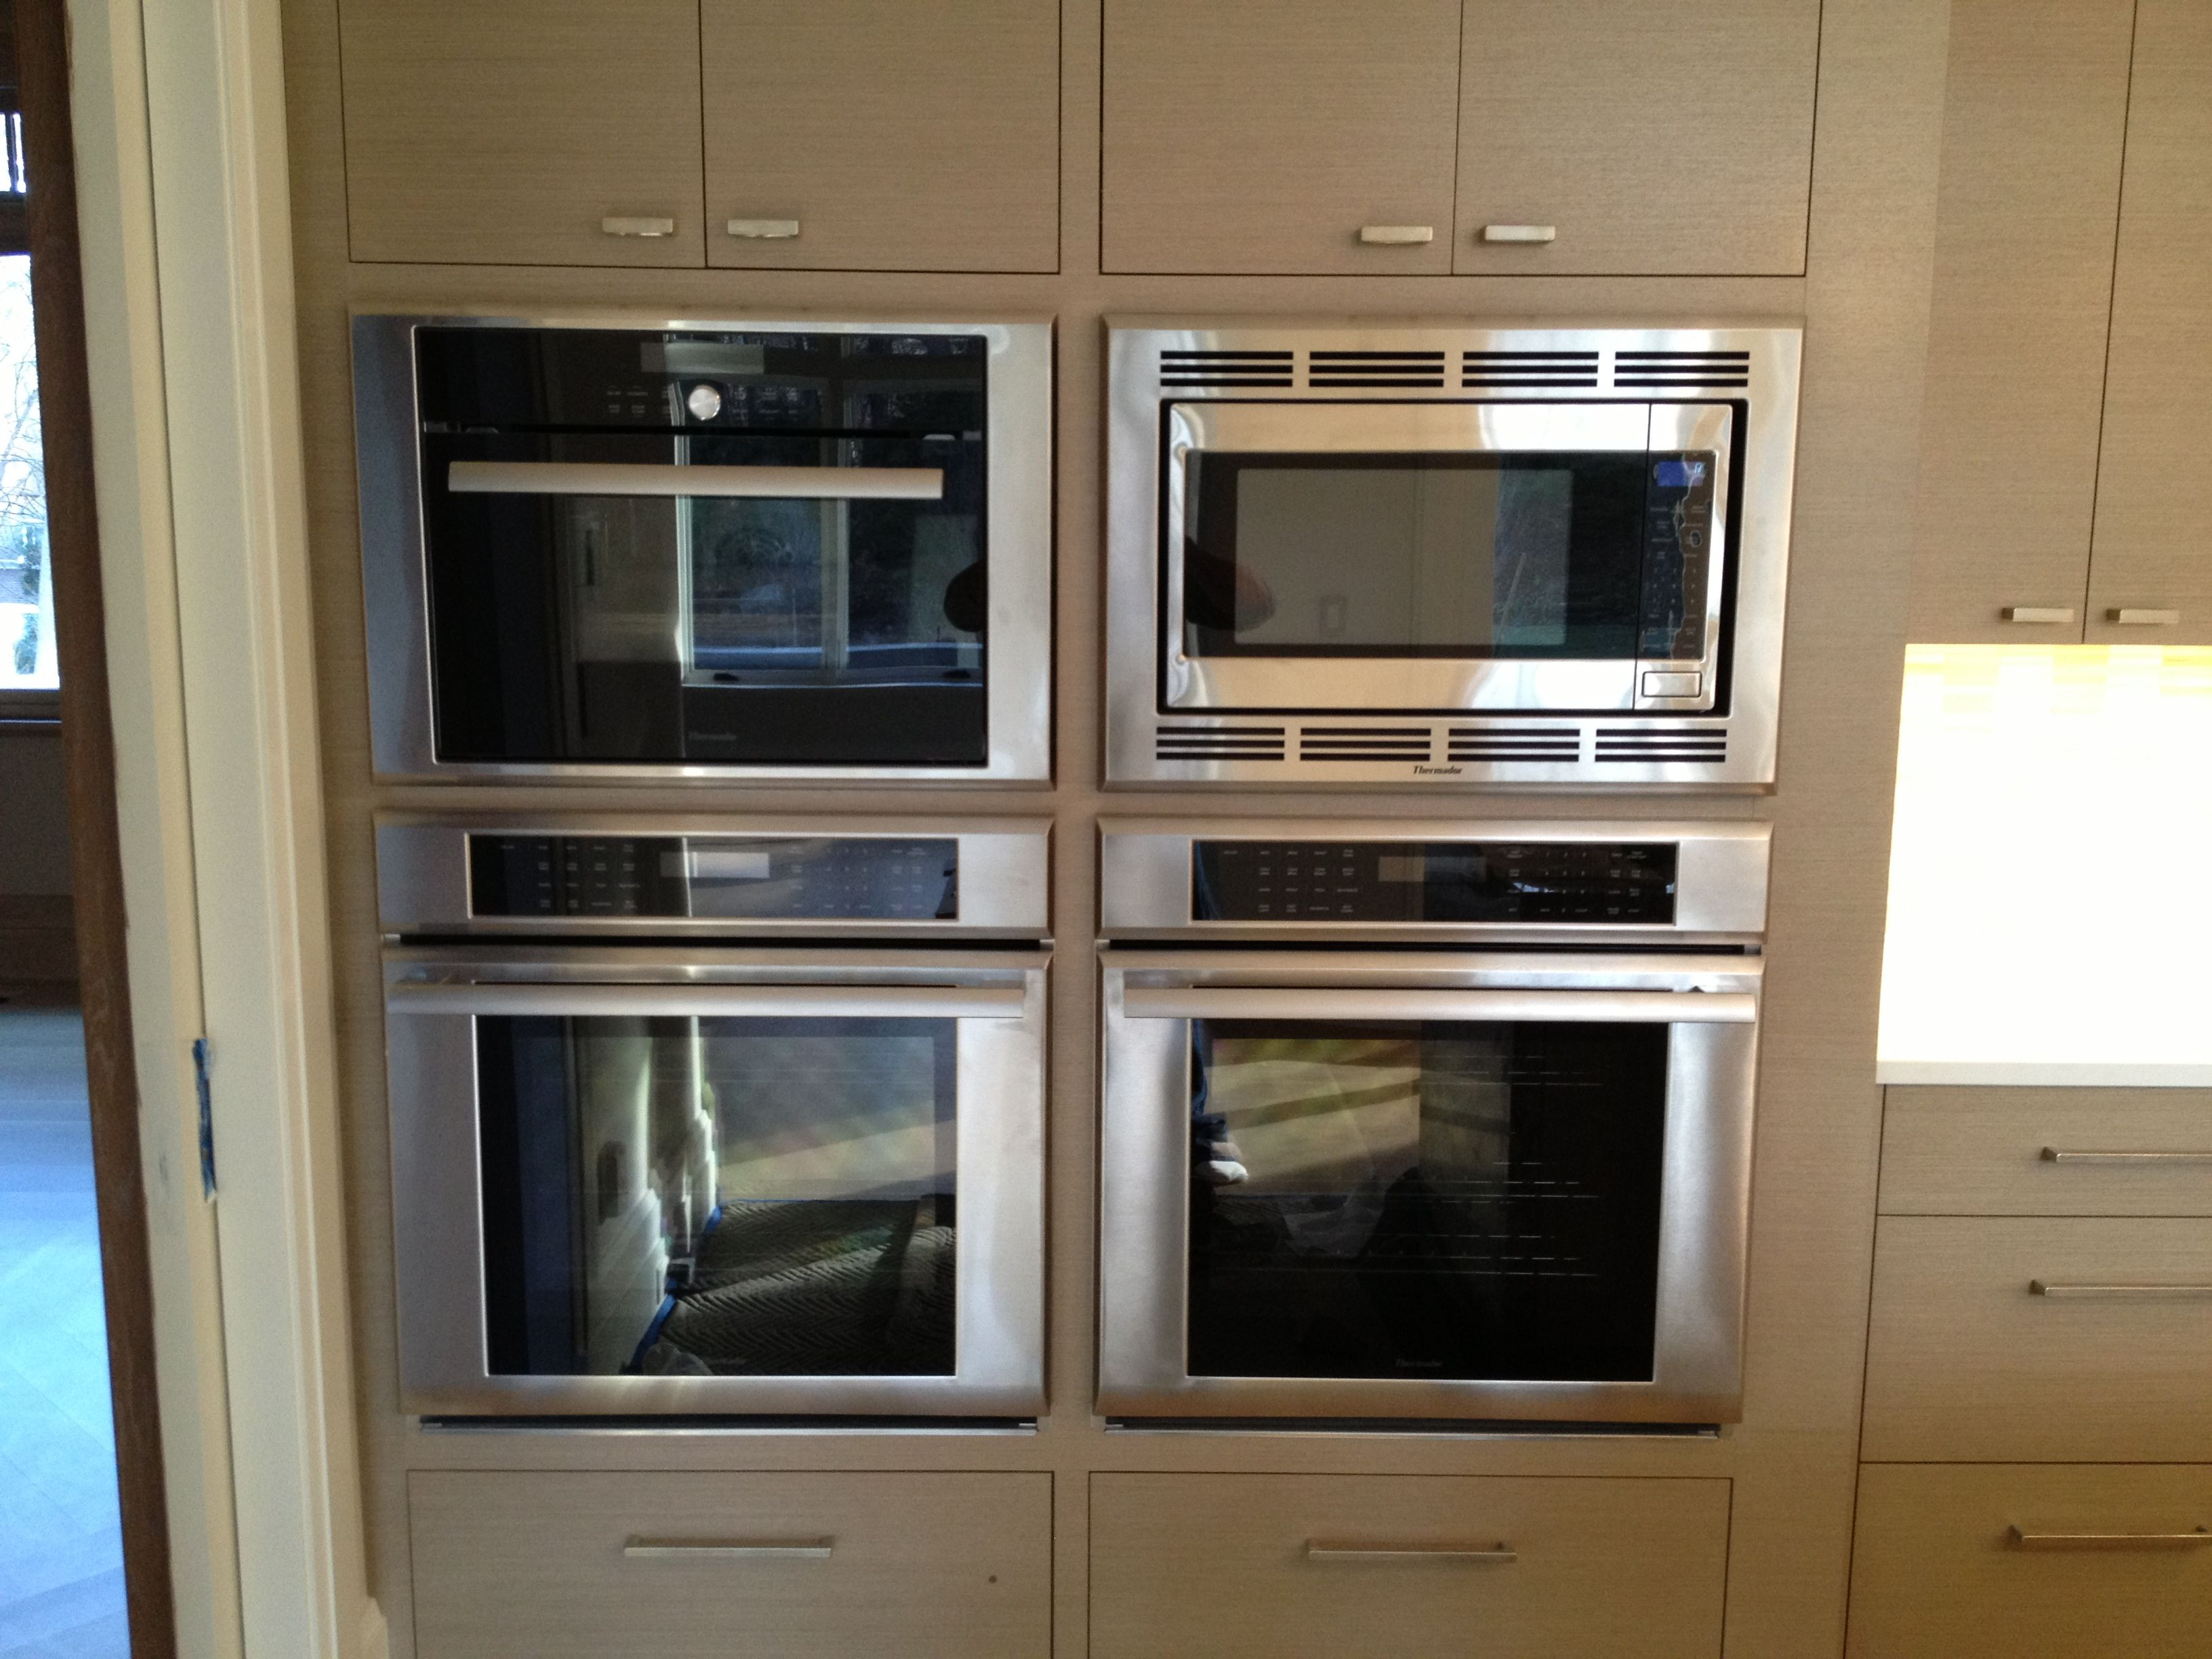 images?q=tbn:ANd9GcQh_l3eQ5xwiPy07kGEXjmjgmBKBRB7H2mRxCGhv1tFWg5c_mWT Kitchenaid Large Appliance Customer Service